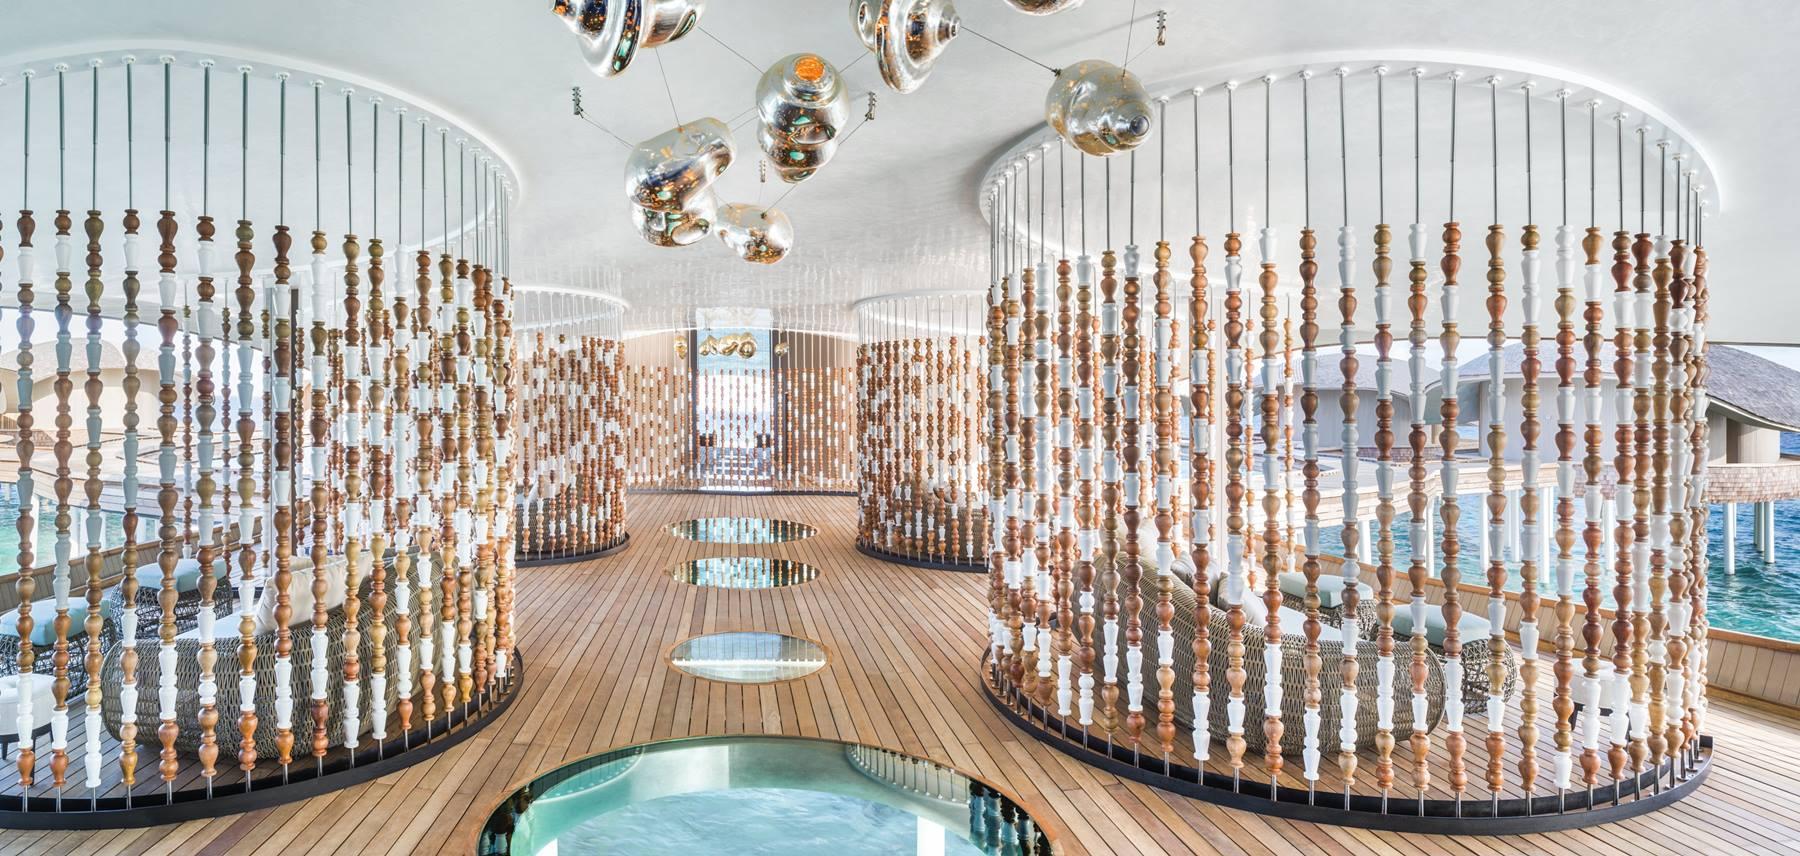 Otelin muhteşem spa merkezi